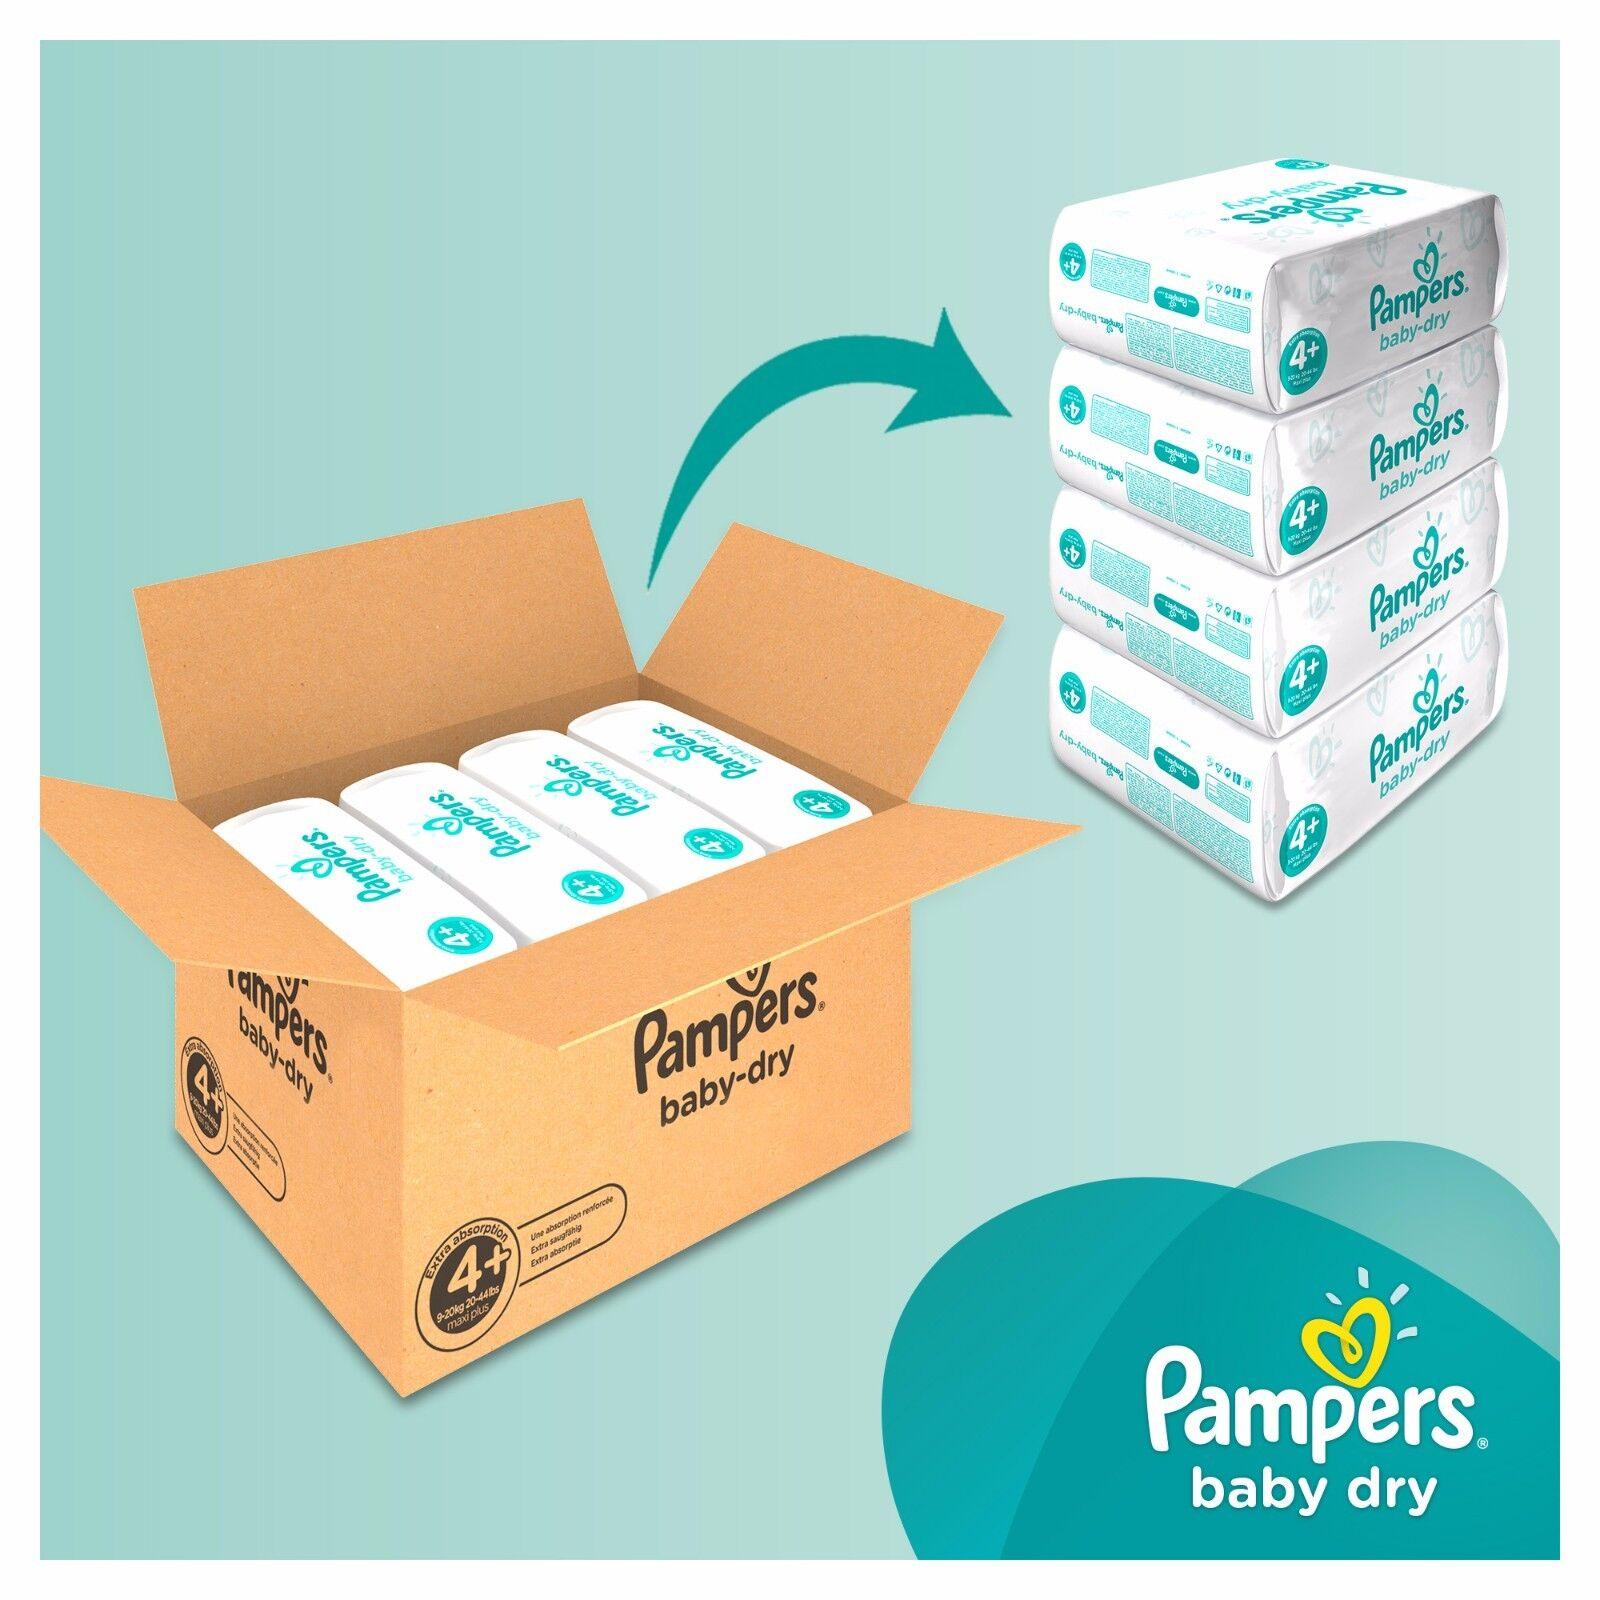 Купить Pampers BABY DRY Nappies Diapers MONTHLY SAVING Pack на eBay ... f7e33c3c8ce